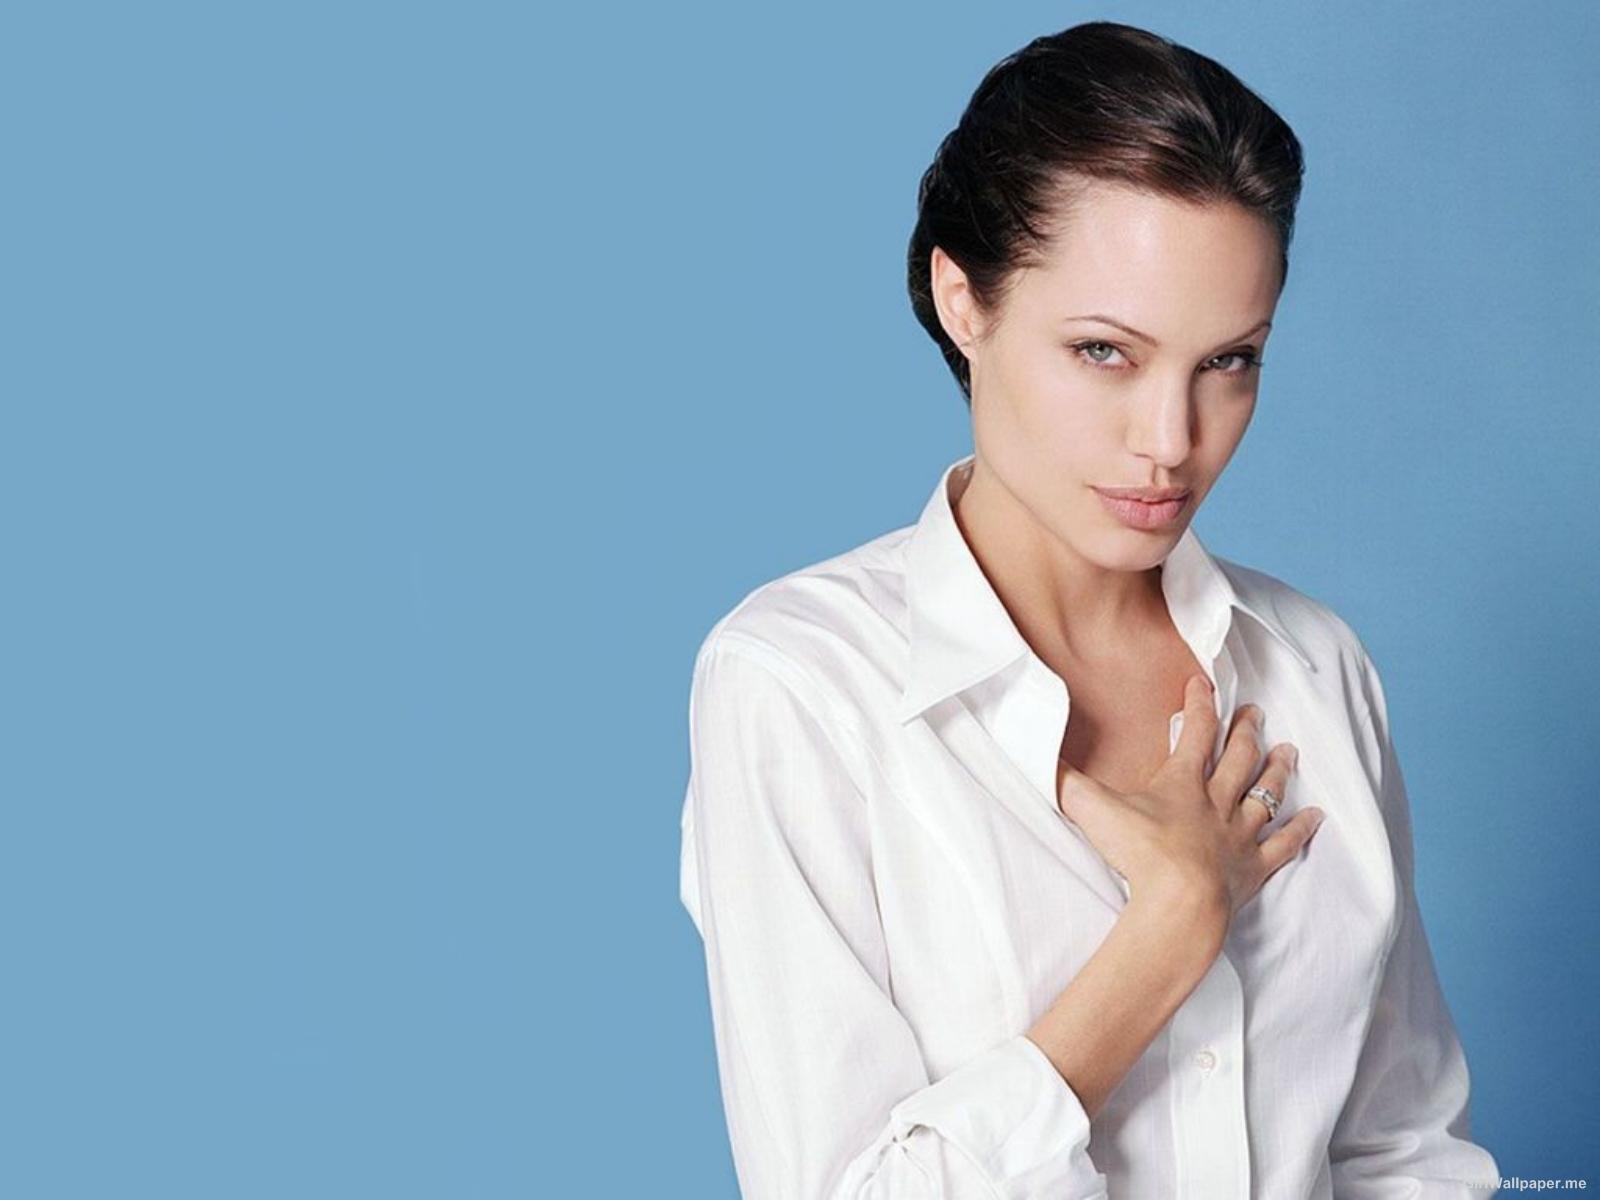 http://4.bp.blogspot.com/_Qtt0T4iTxQk/S_UnEYKTYTI/AAAAAAAAAx0/O6gsj4Jlh78/s1600/angelina_jolie_01.jpg